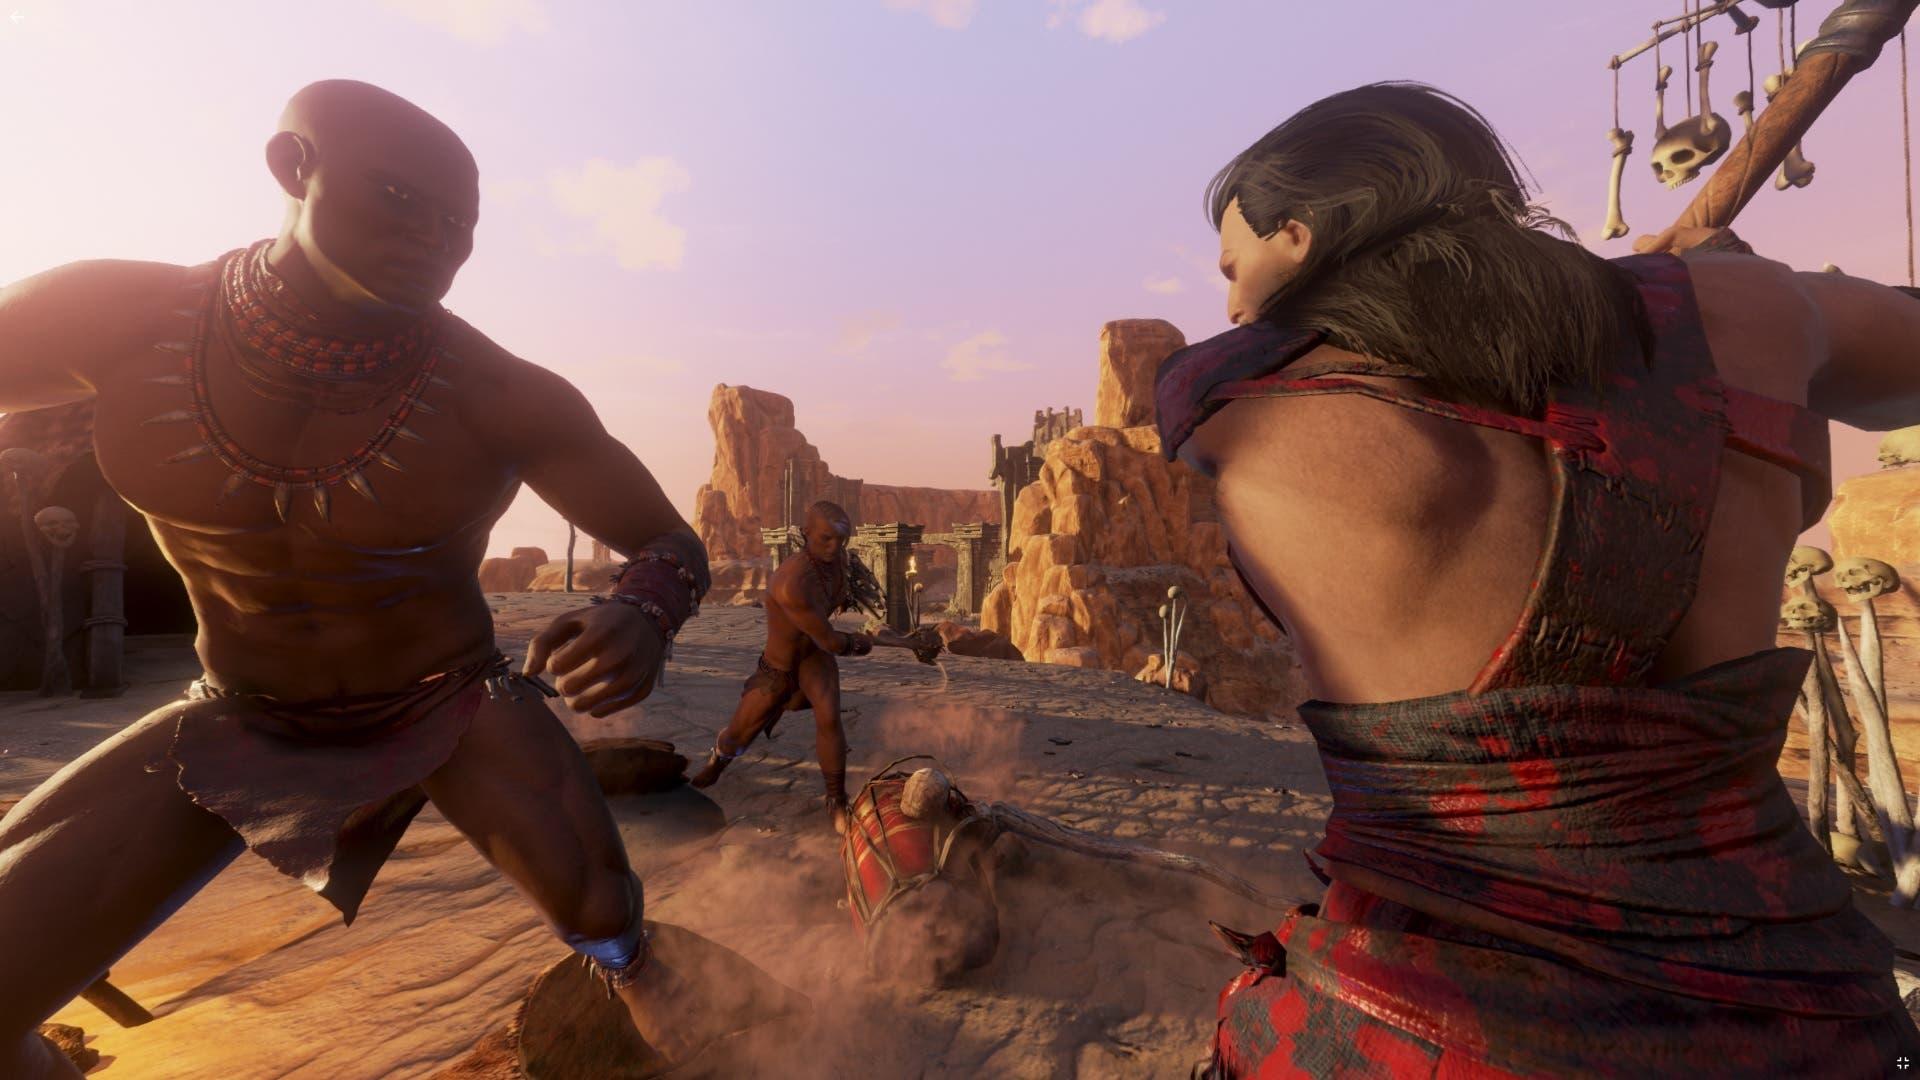 No habrá desnundos integrales en Conan Exiles en Xbox One 2